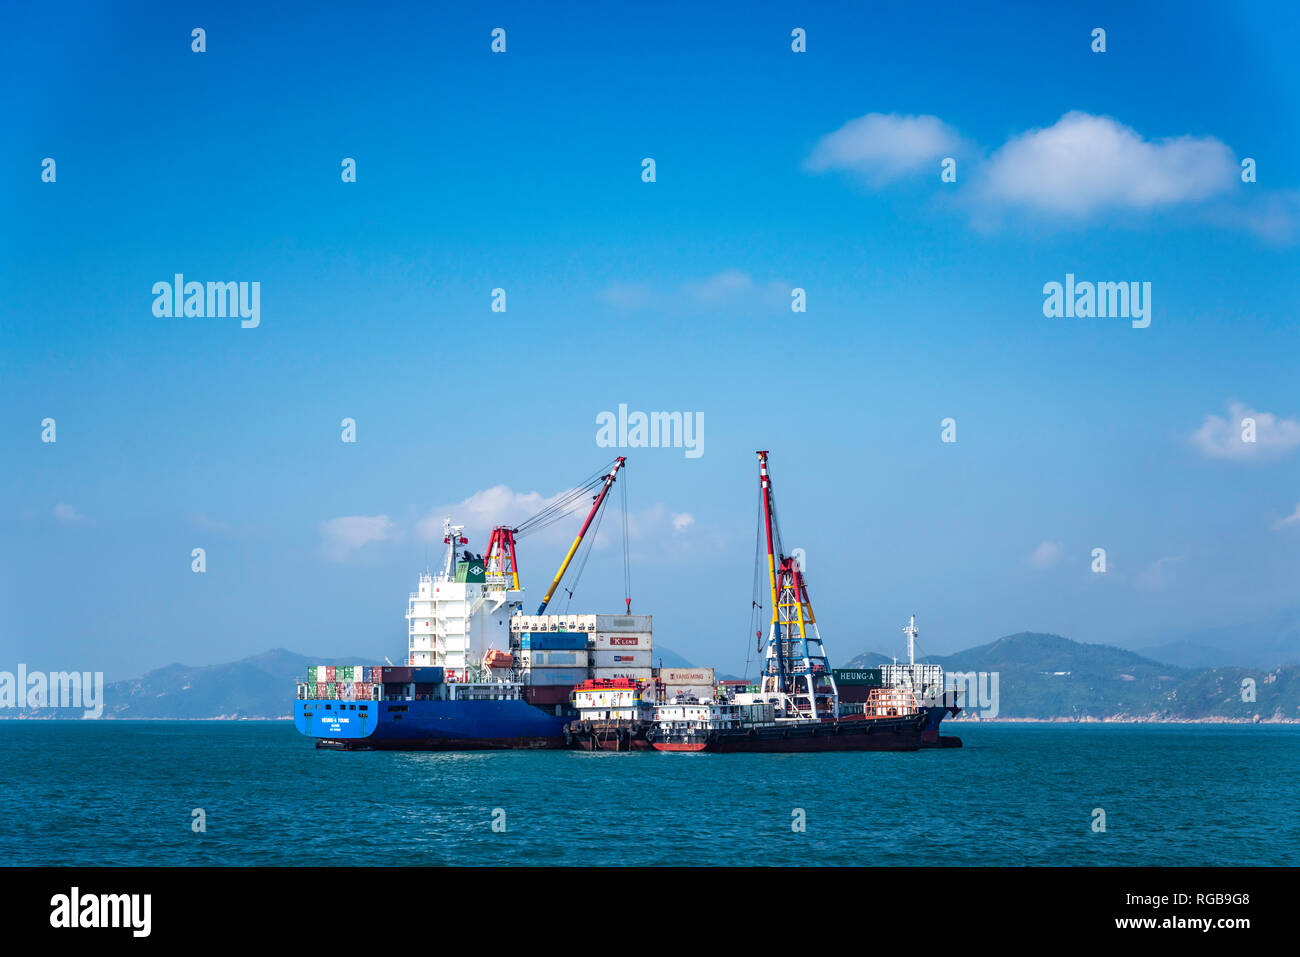 Cargo ships anchored in Victoria Harbor, Hong Kong, China, Asia. - Stock Image